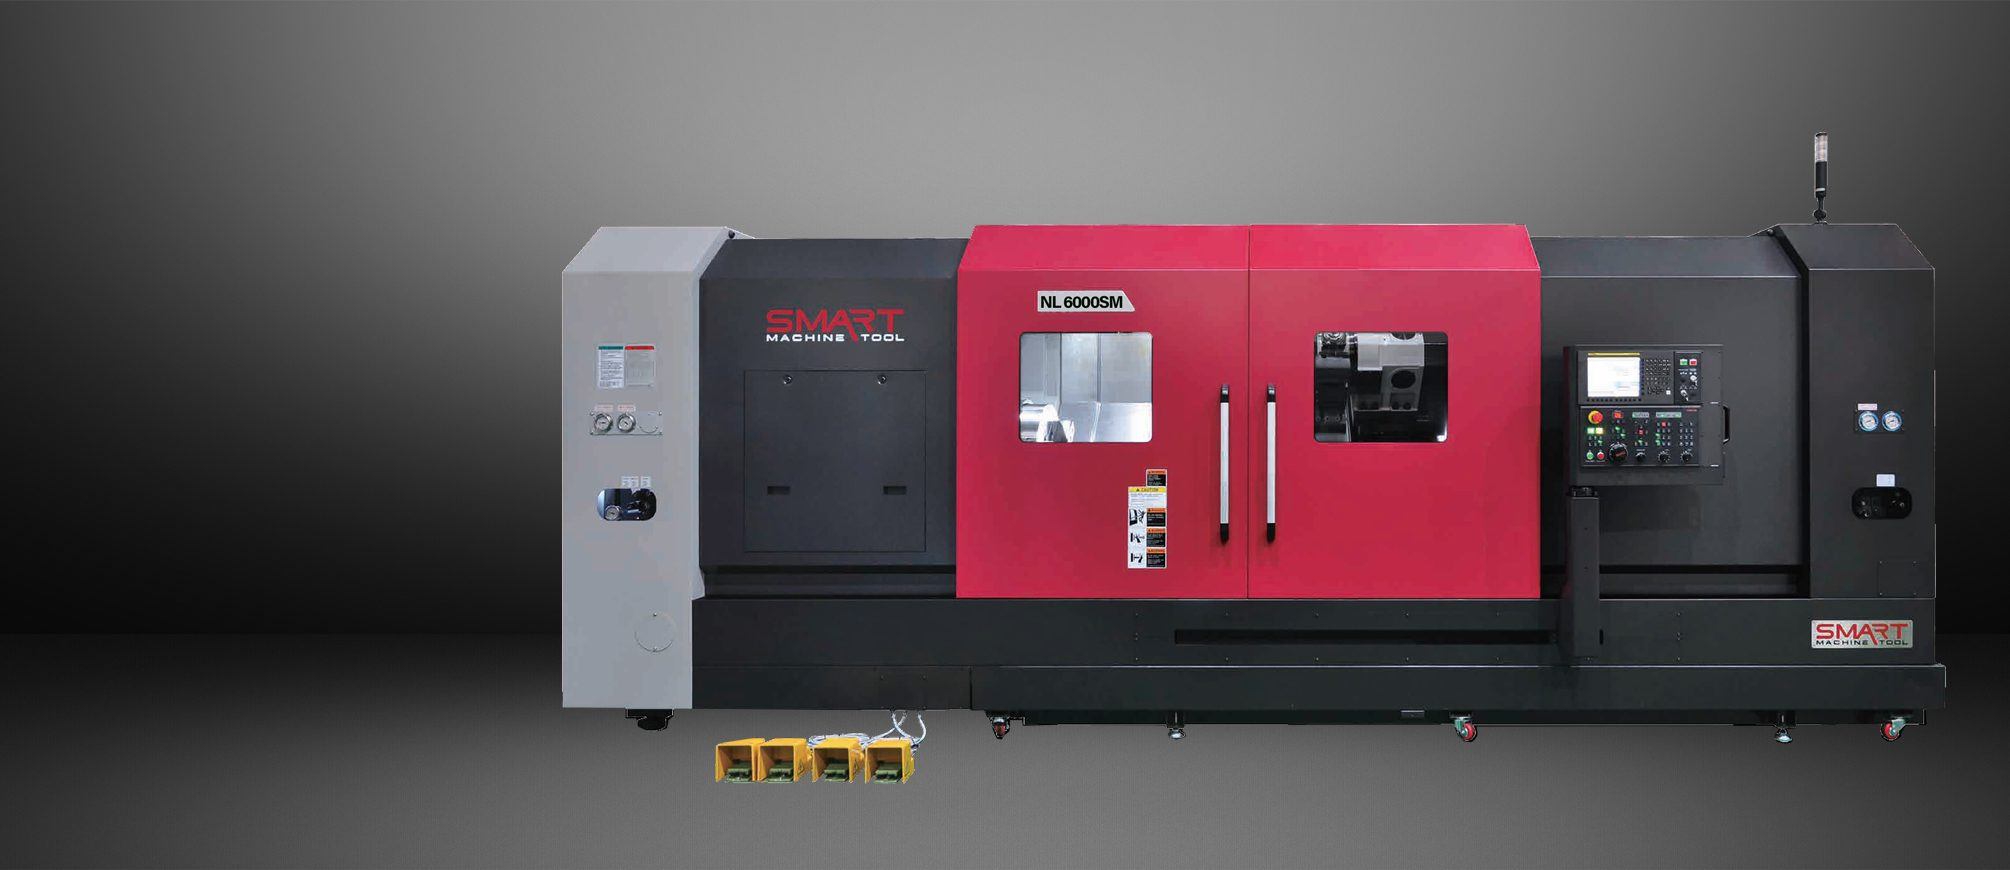 SMART NL 6000SM – BOX WAY – (24″ CHUCK) 3-Axis CNC Lathes